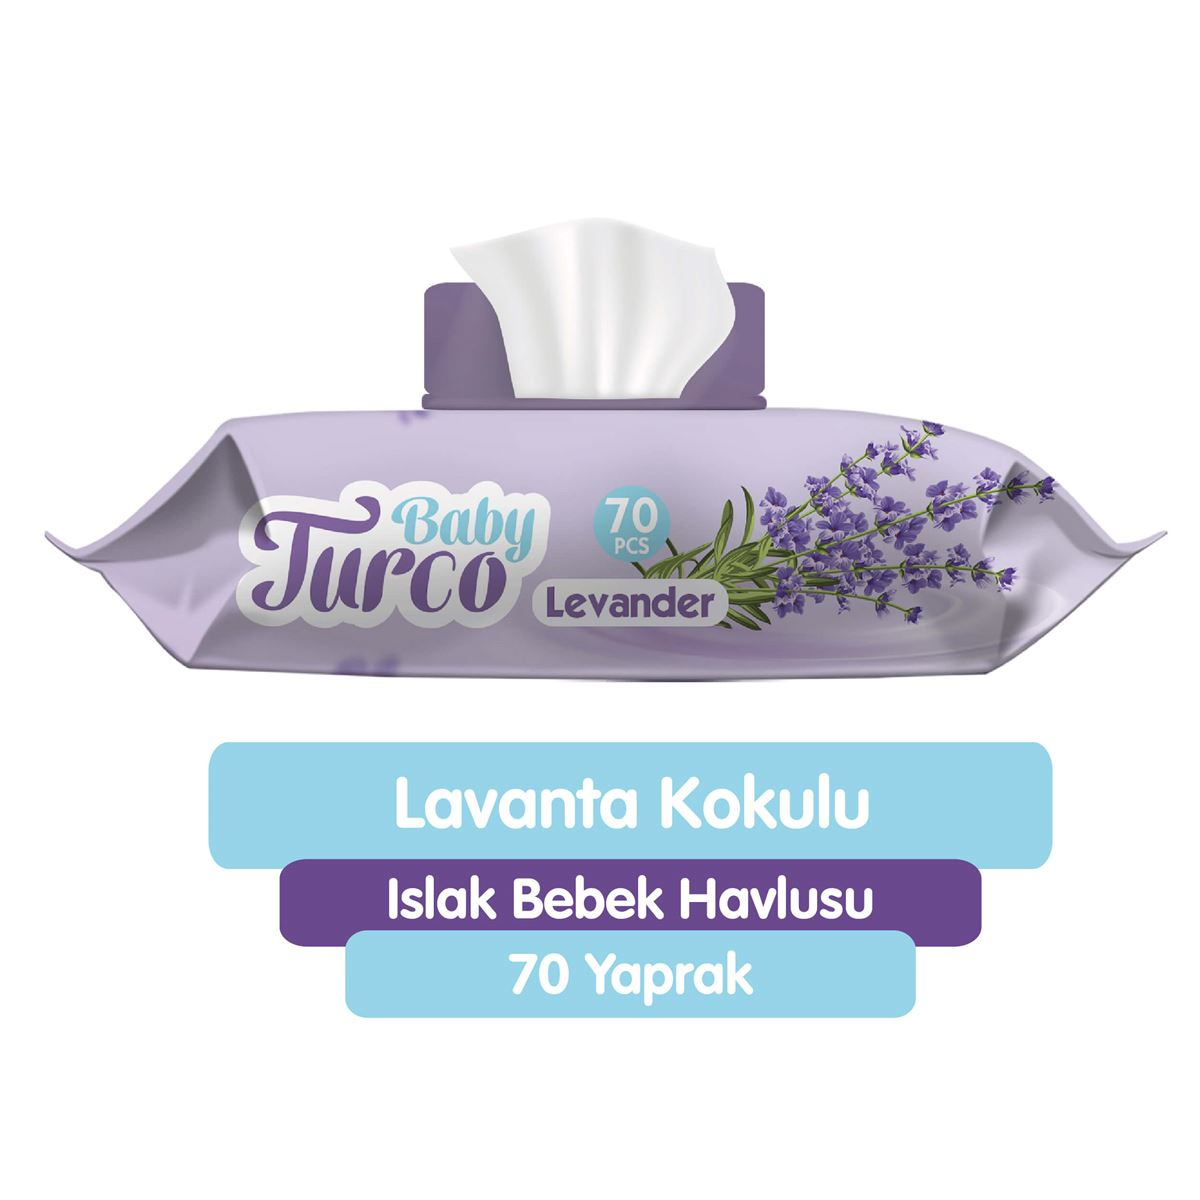 Baby Turco Lavanta Kokulu Islak Bebek Havlusu 70 Adet